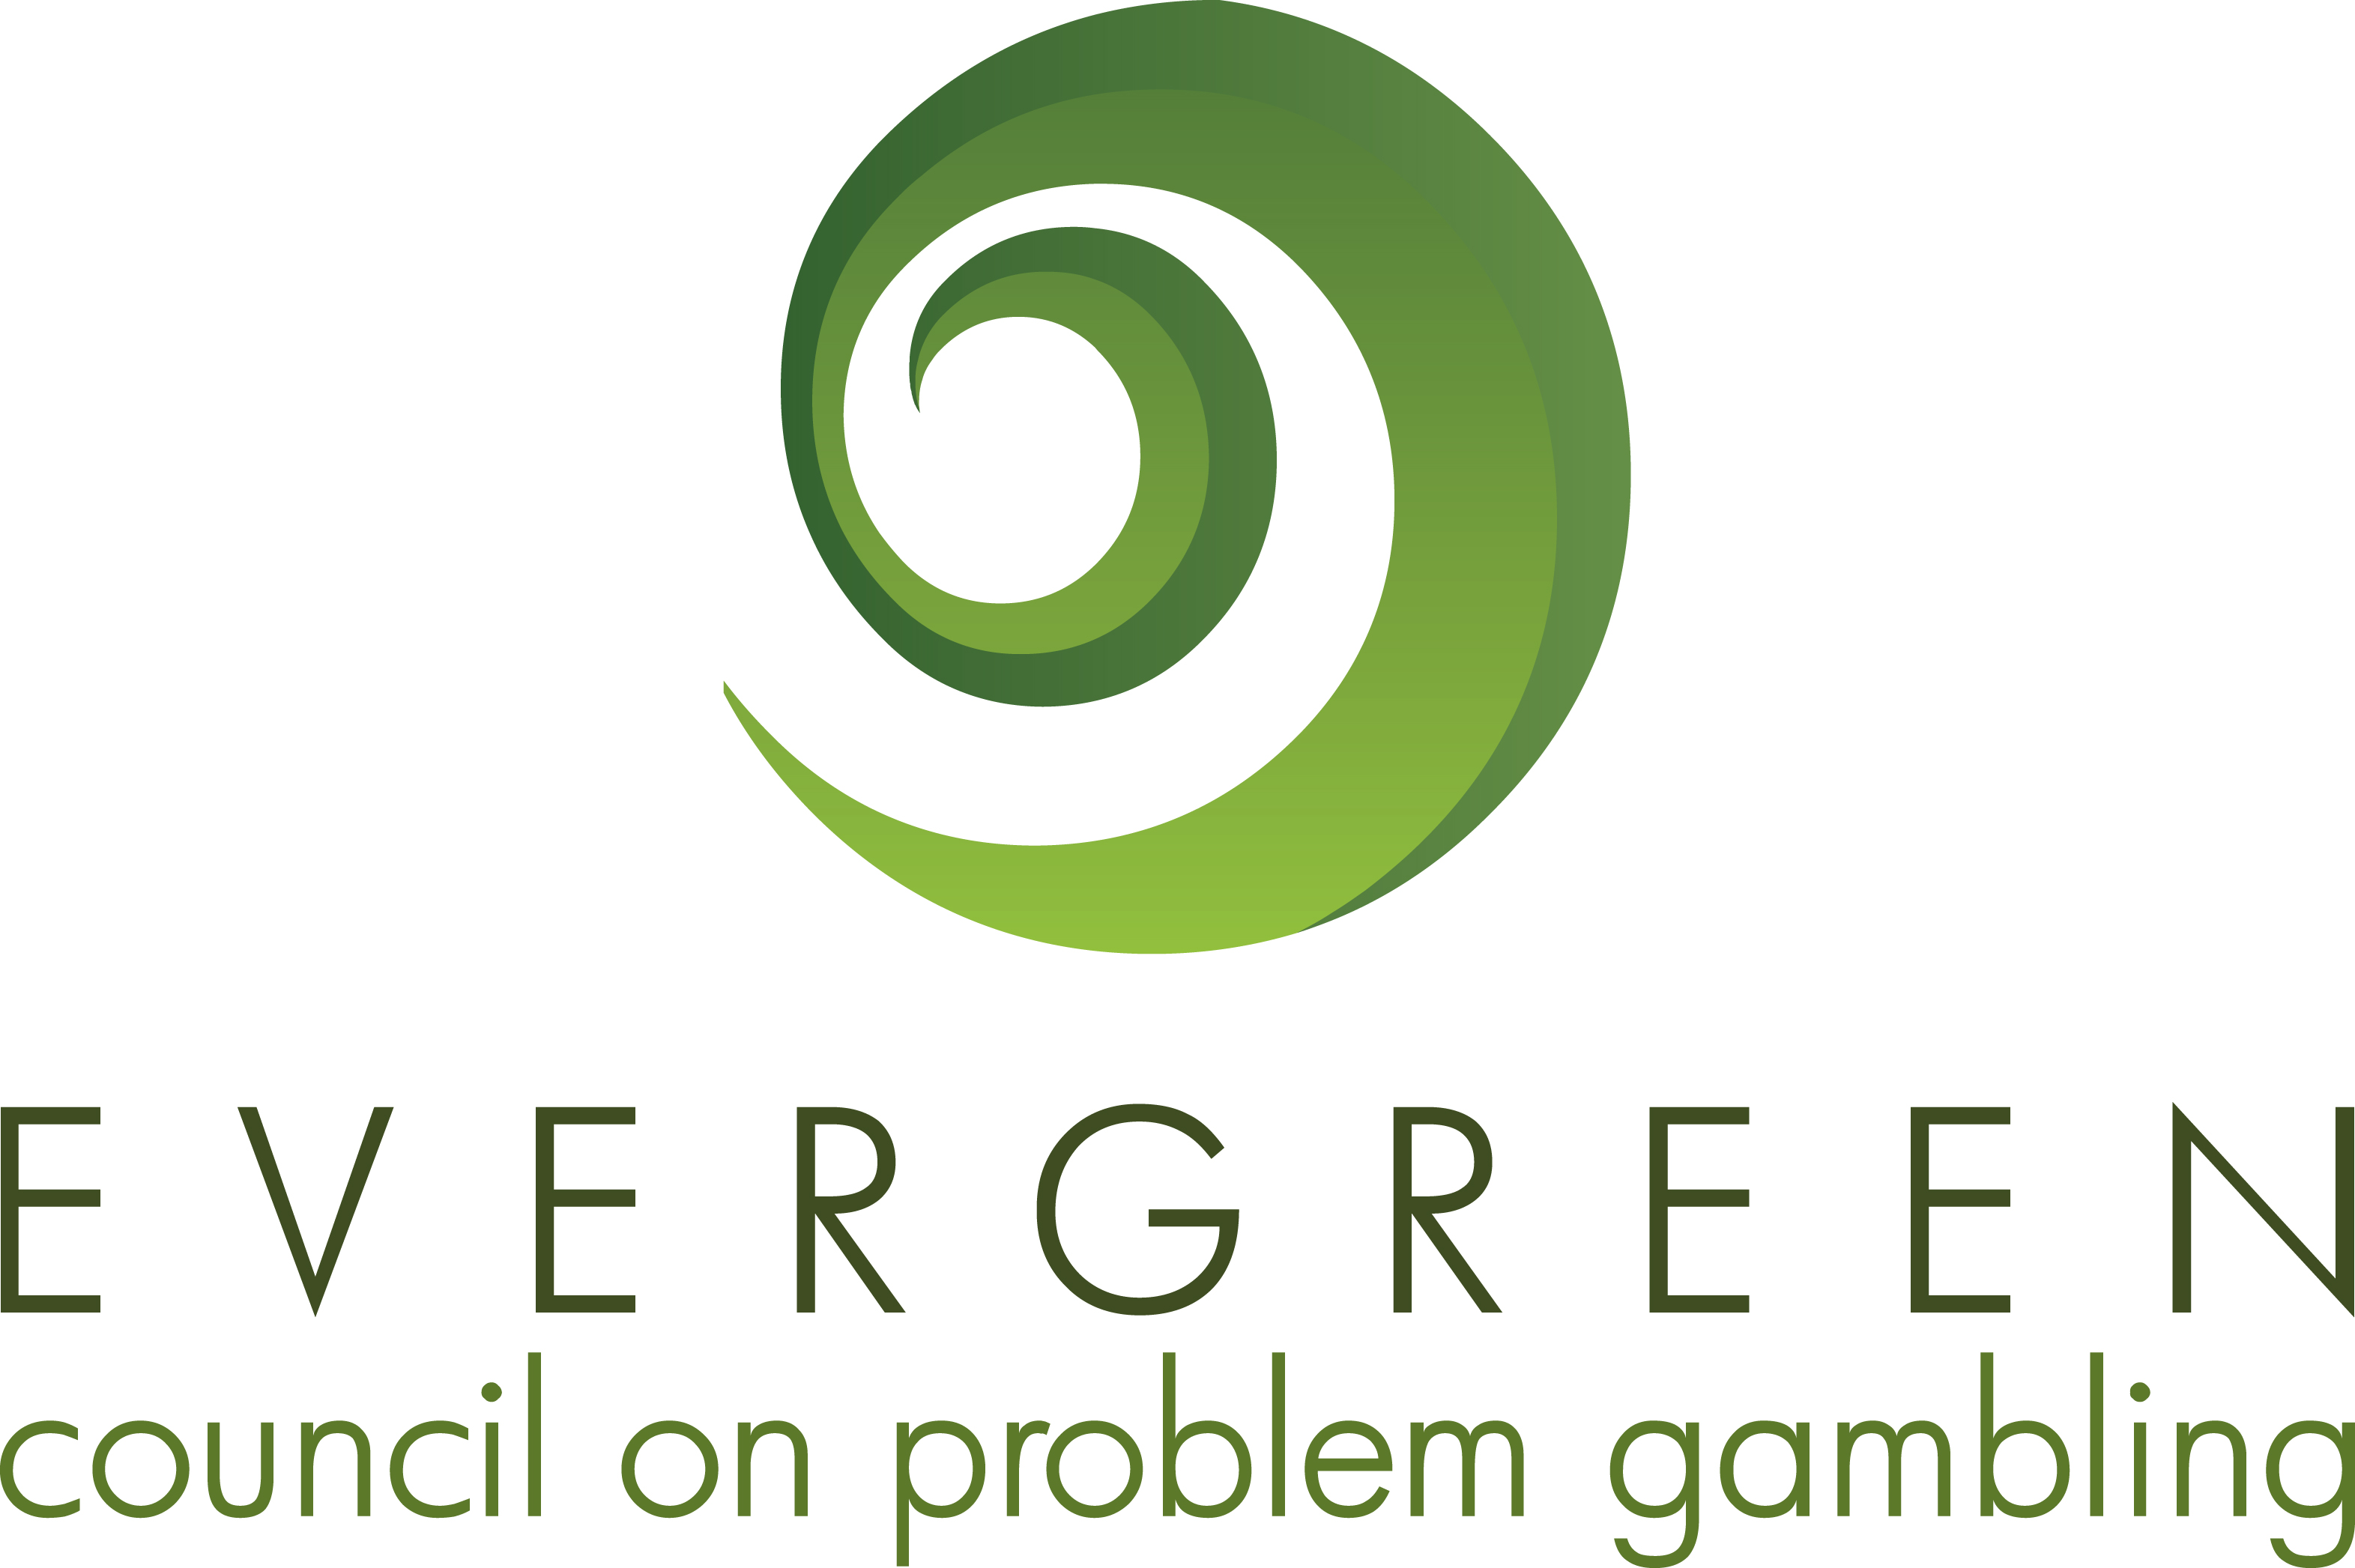 ECPG-Logo_2013-stack1_cmyk